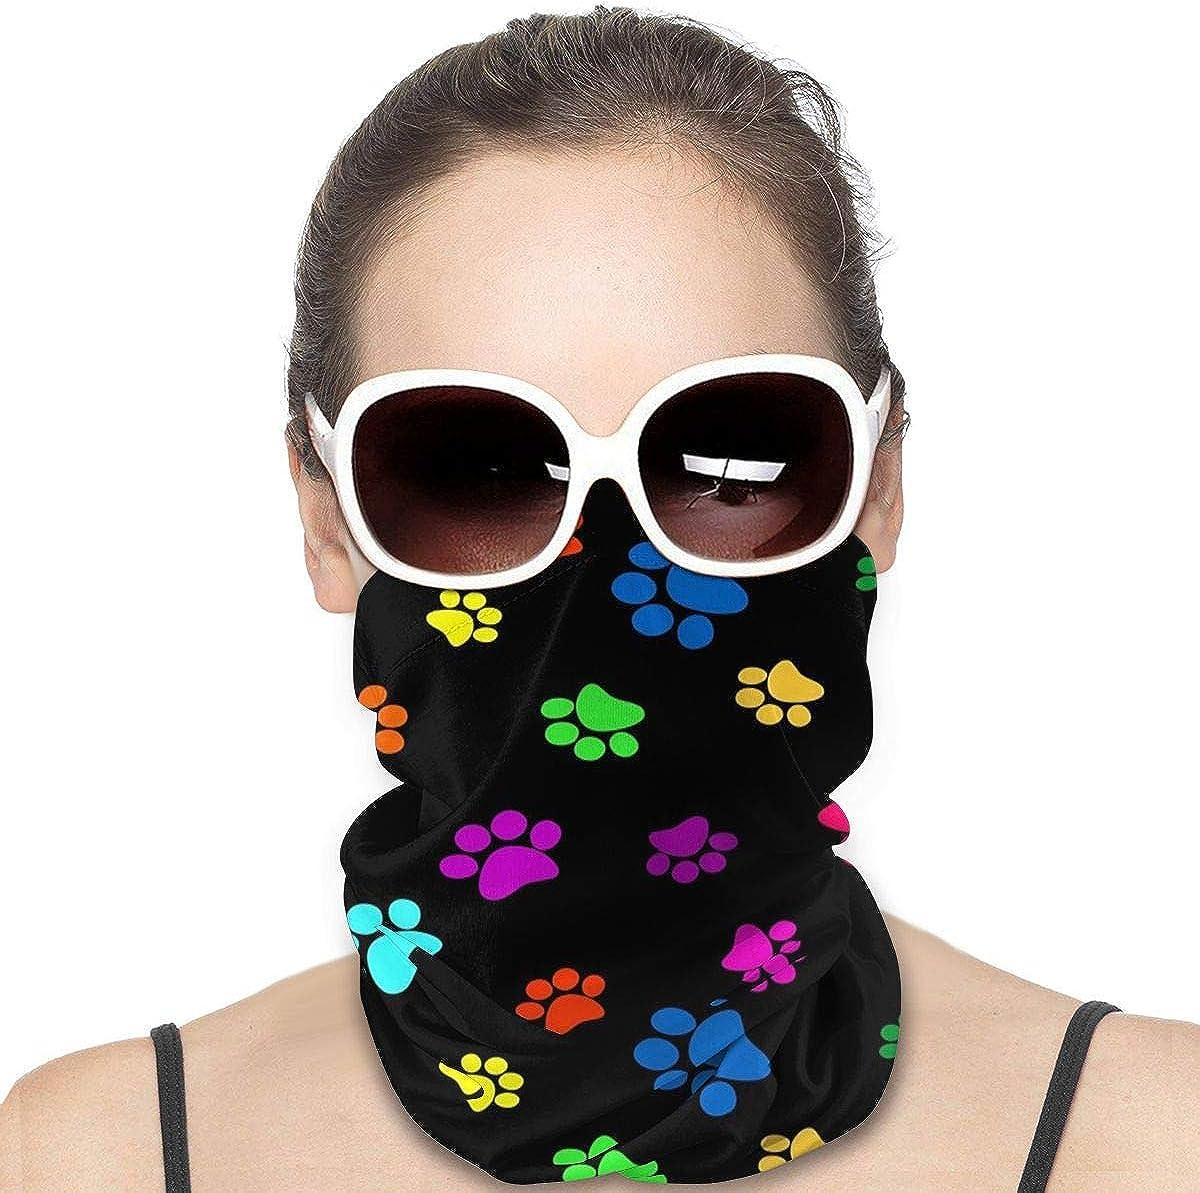 KiuLoam Women Bandanas Face Mask, Color Paw Prints on Black Neck Gaiter Mask Headband for Men Face Scarf Dust, Outdoors, Sports